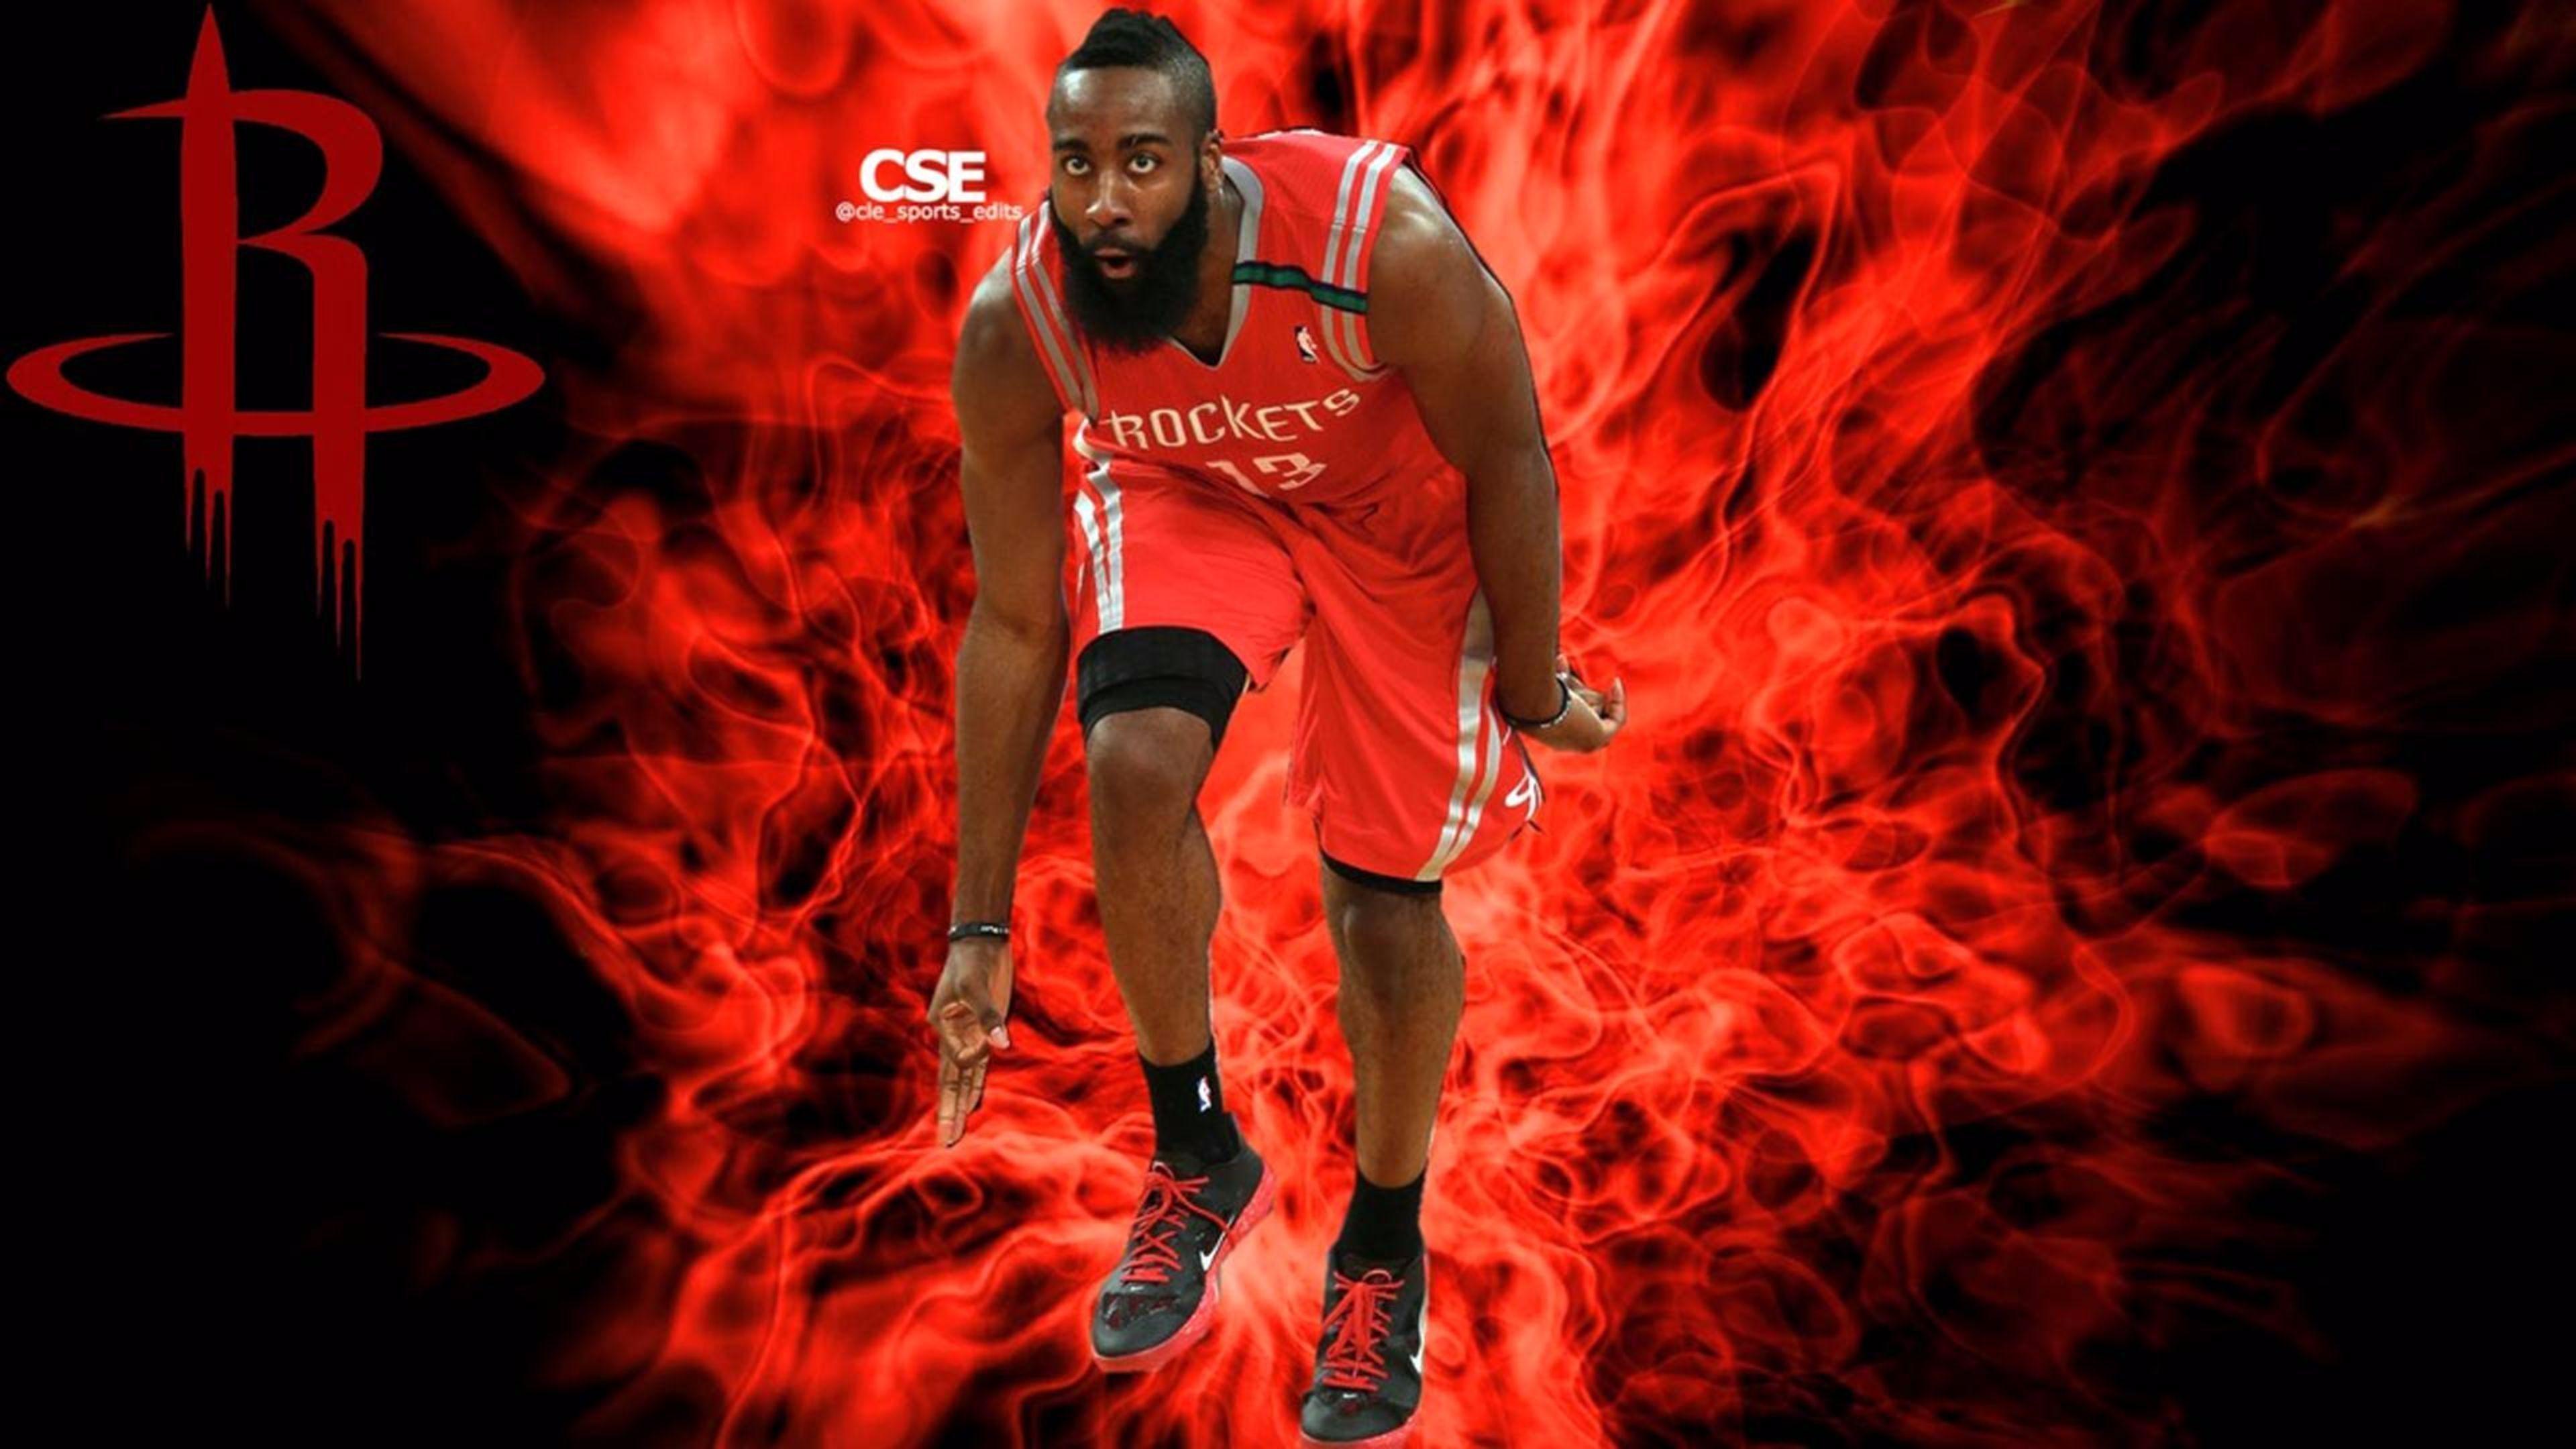 Inspring NBA 4K James Harden Wallpapers   Free 4K Wallpaper